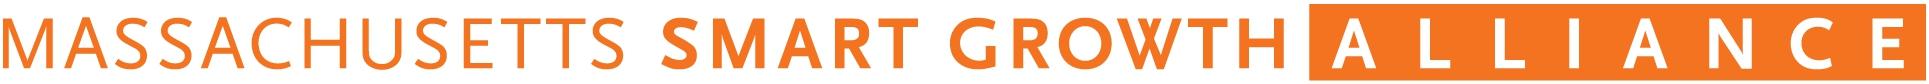 Masscusetts Smart Growth Alliance logo